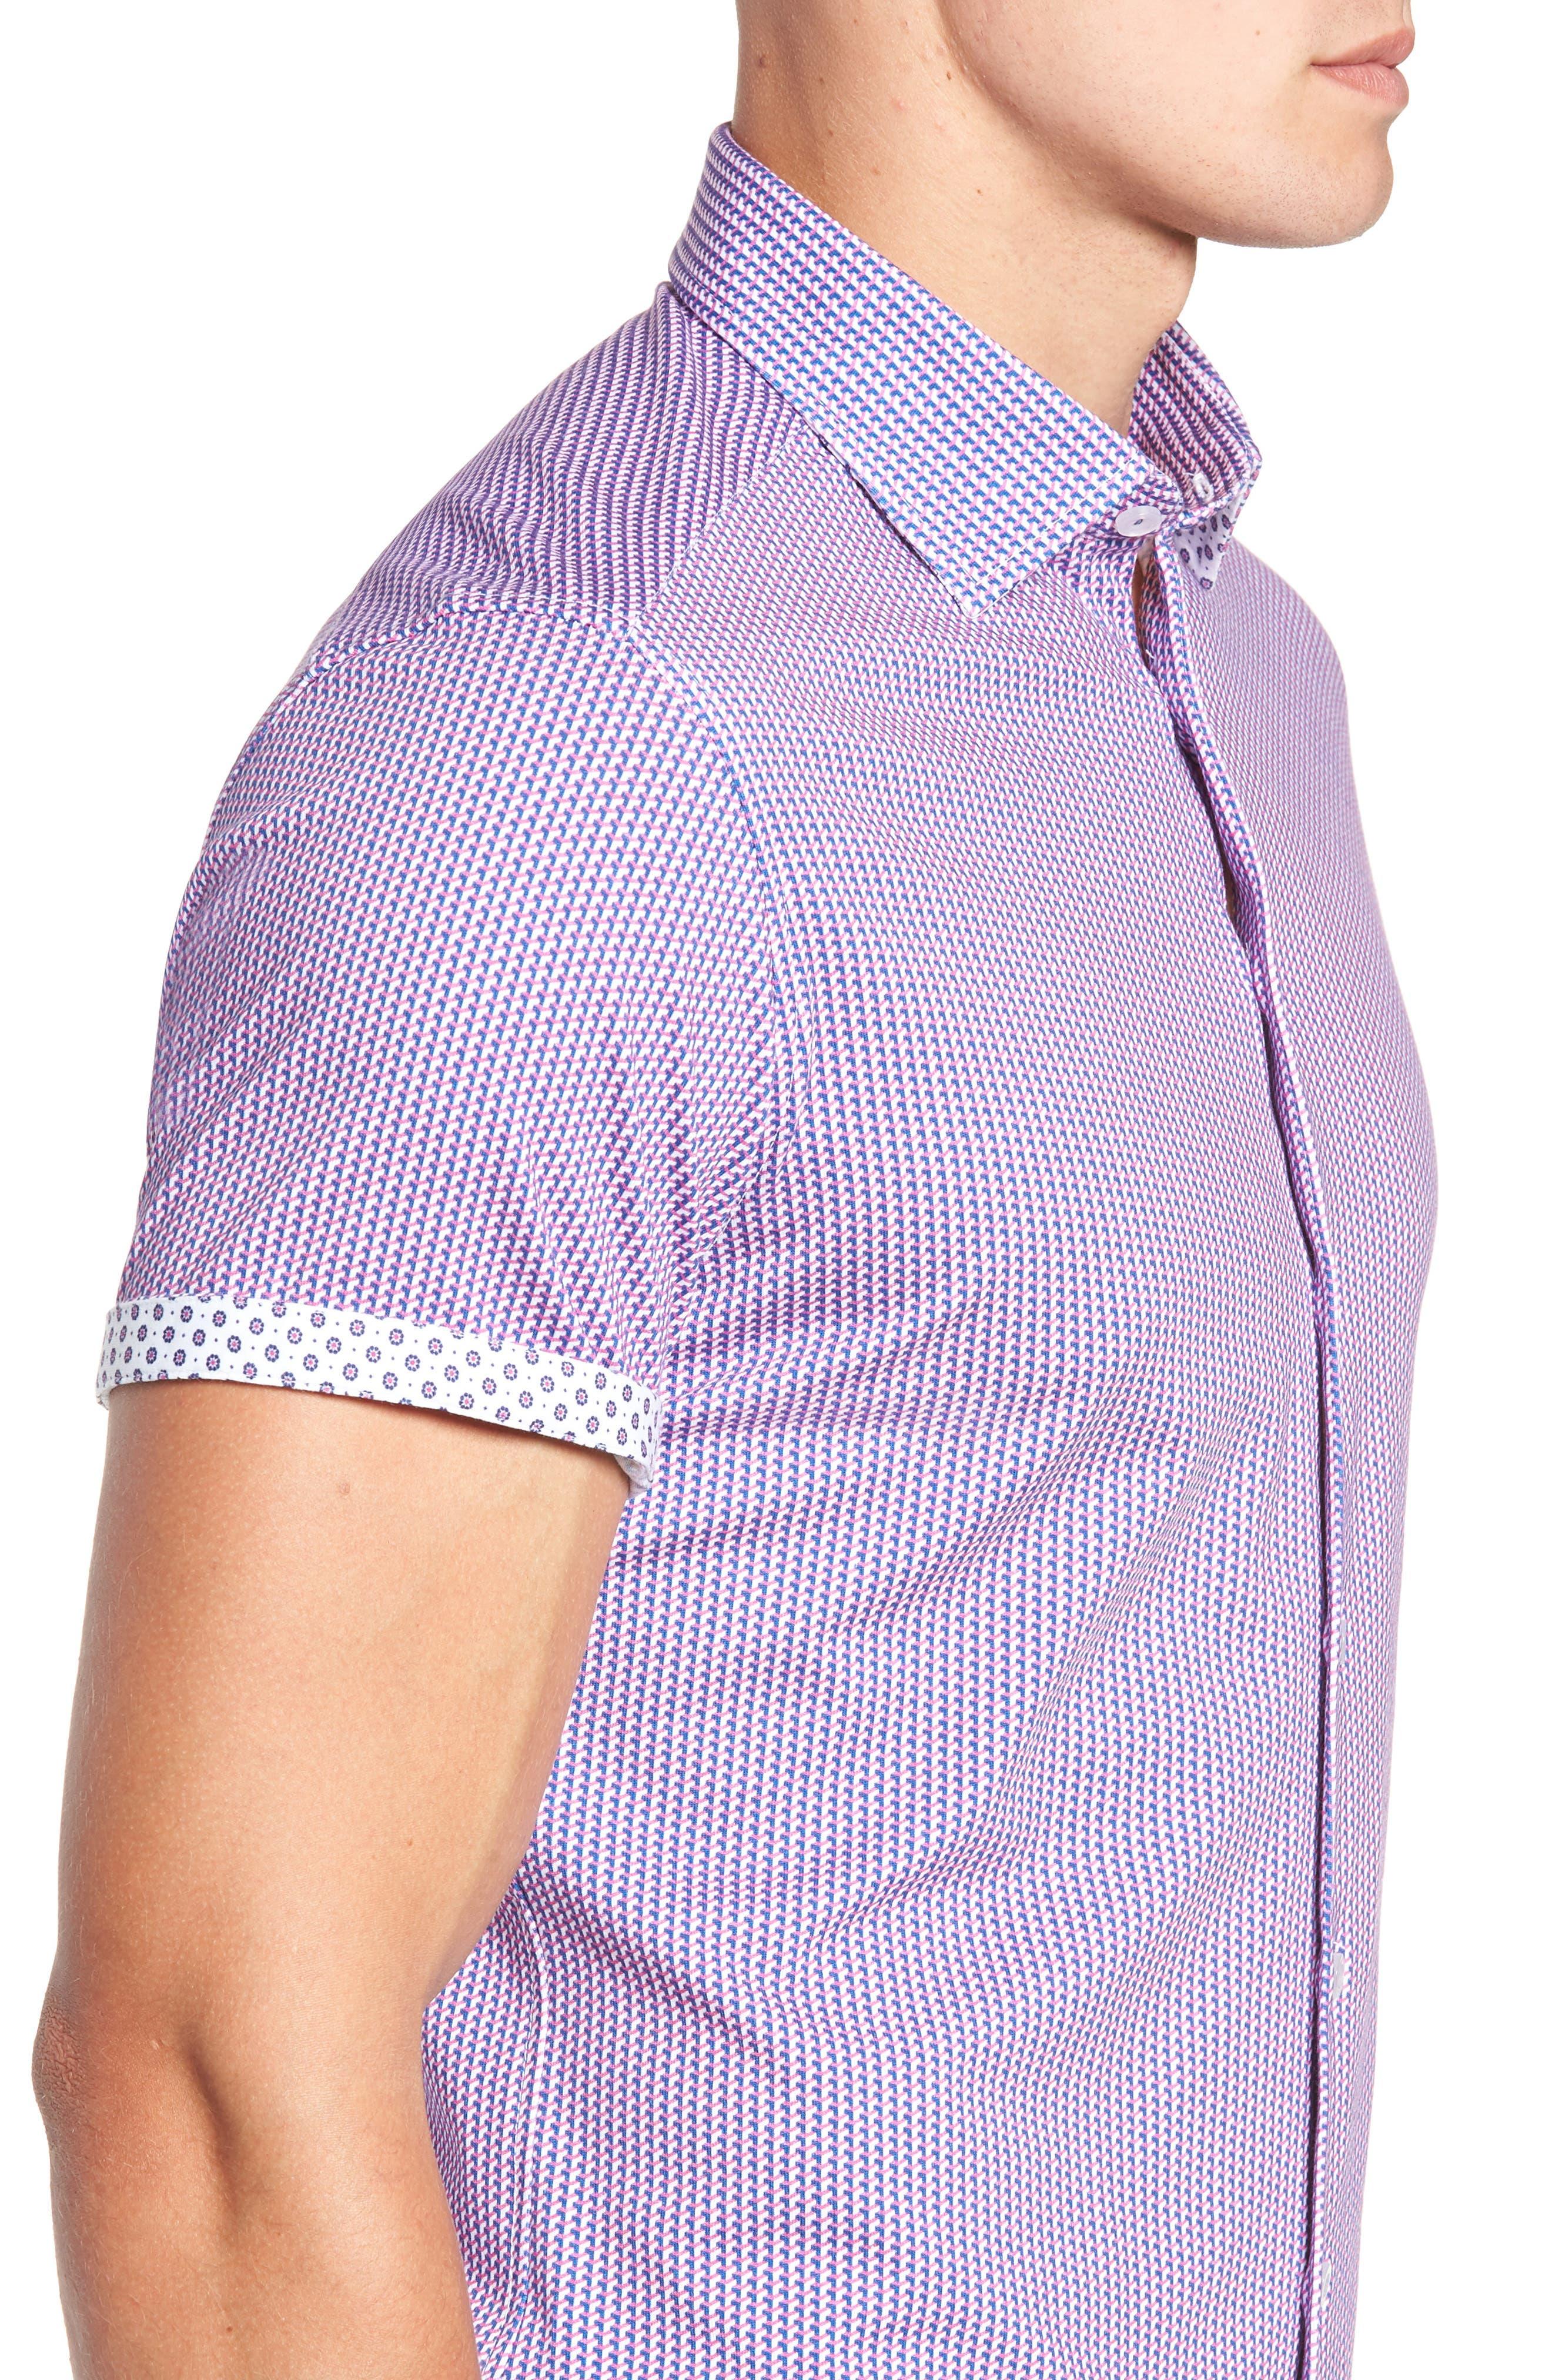 Regular Fit Geometric Print Knit Sport Shirt,                             Alternate thumbnail 2, color,                             650